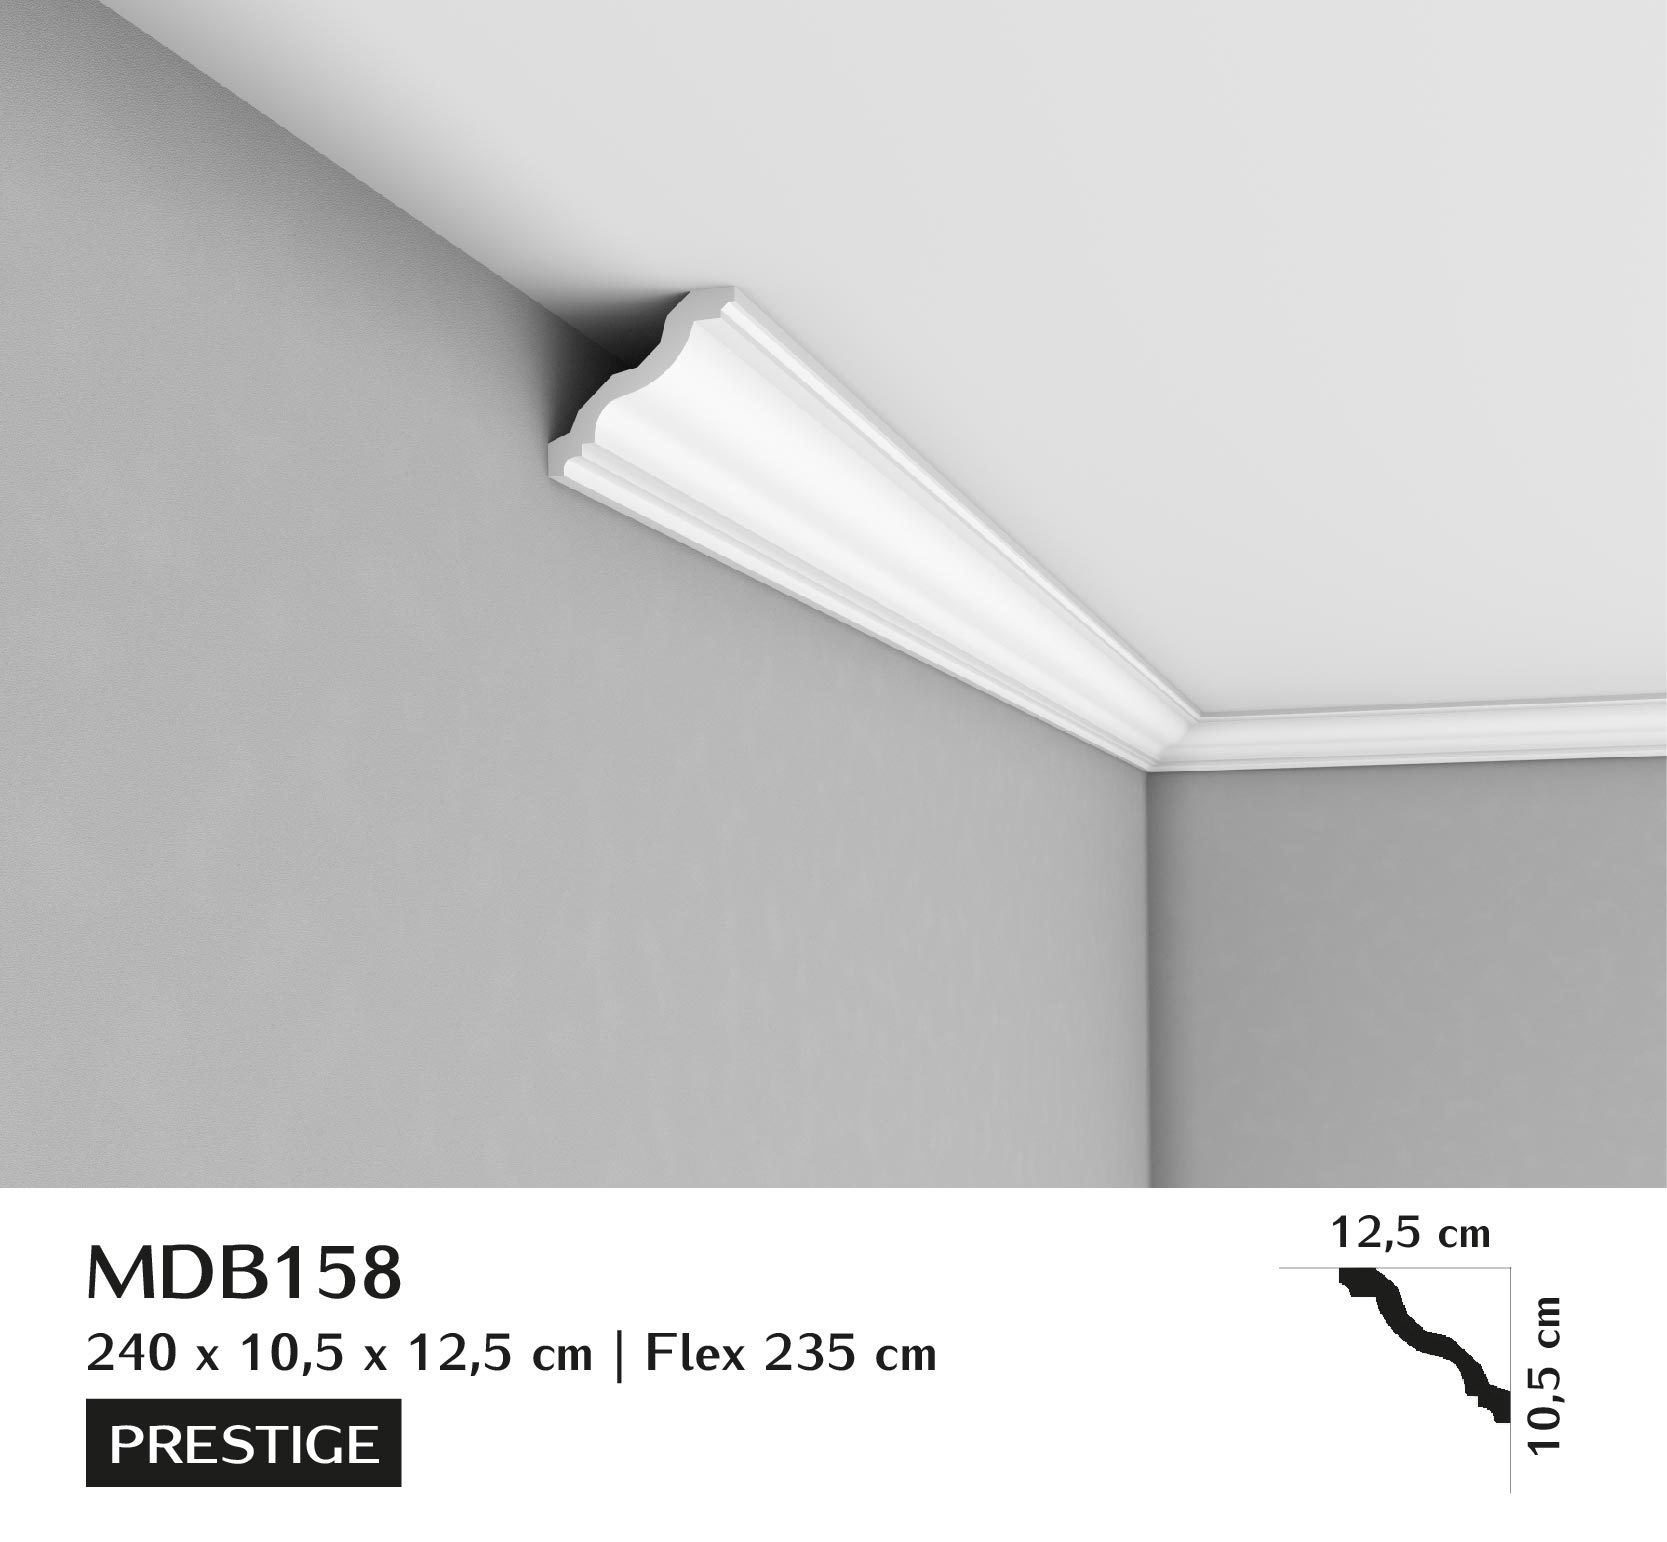 Mdb158